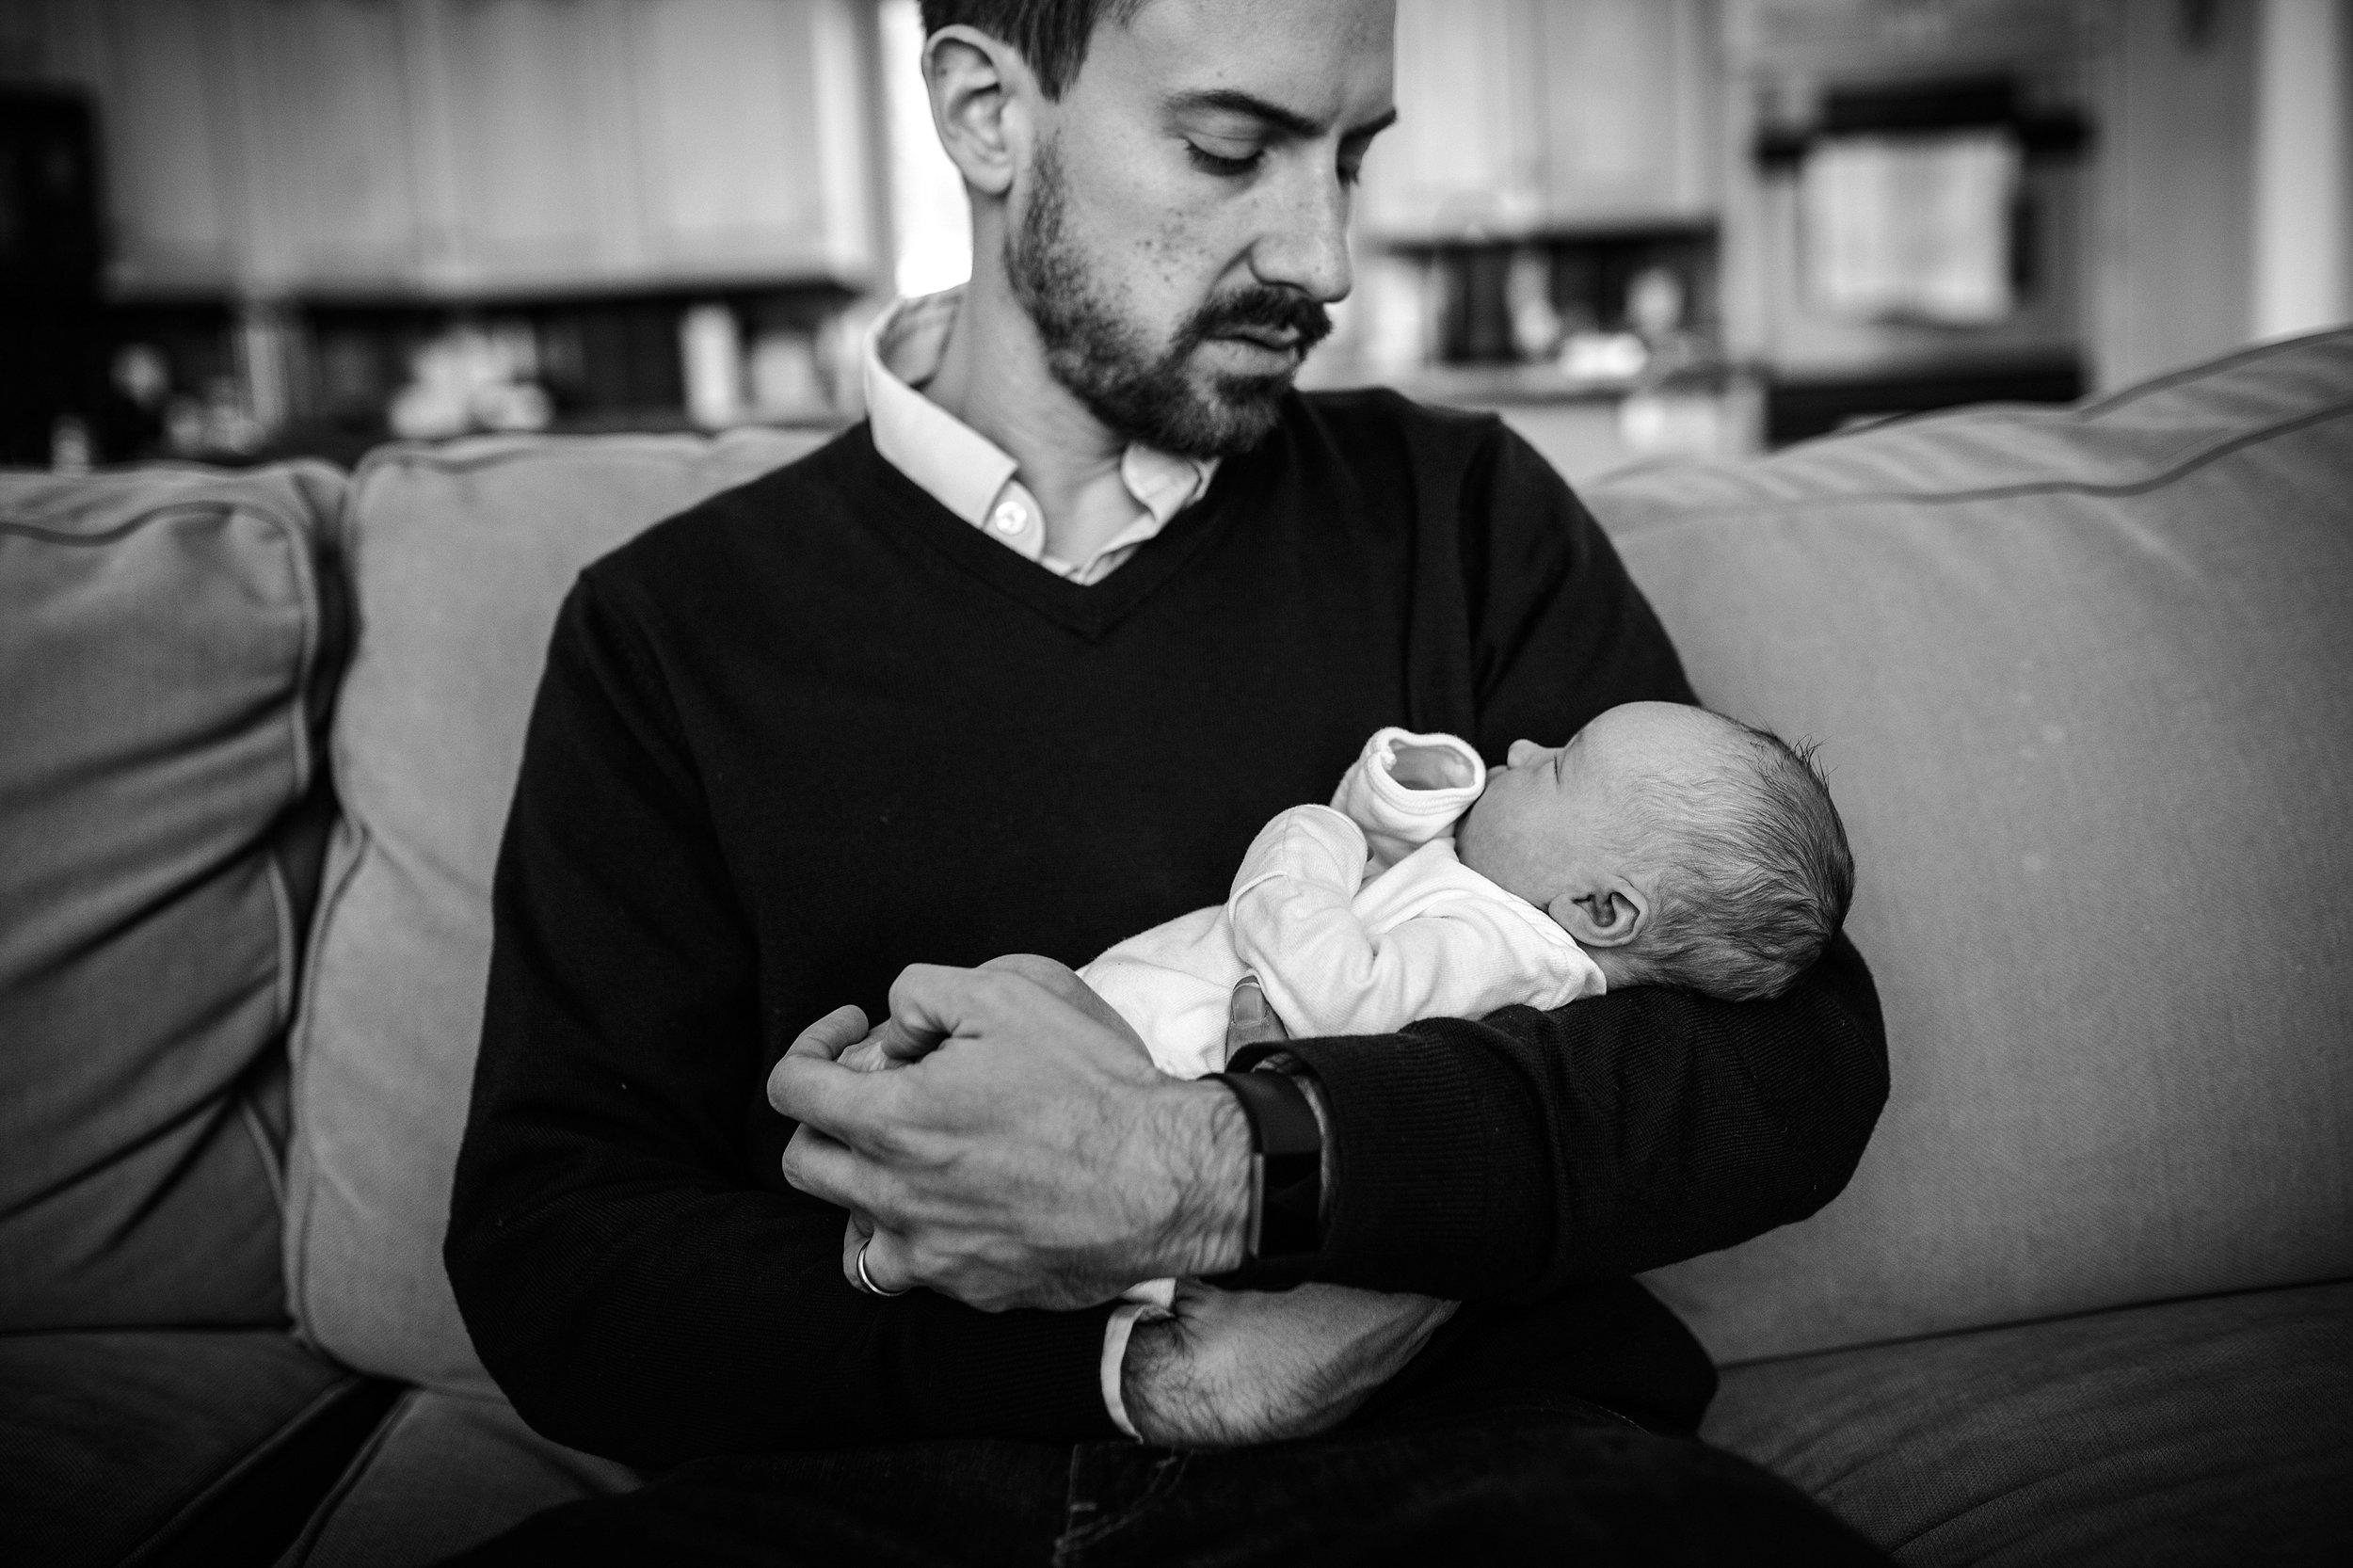 Lehigh-Valley-Documentary-Newborn-Photographer_0064.jpg